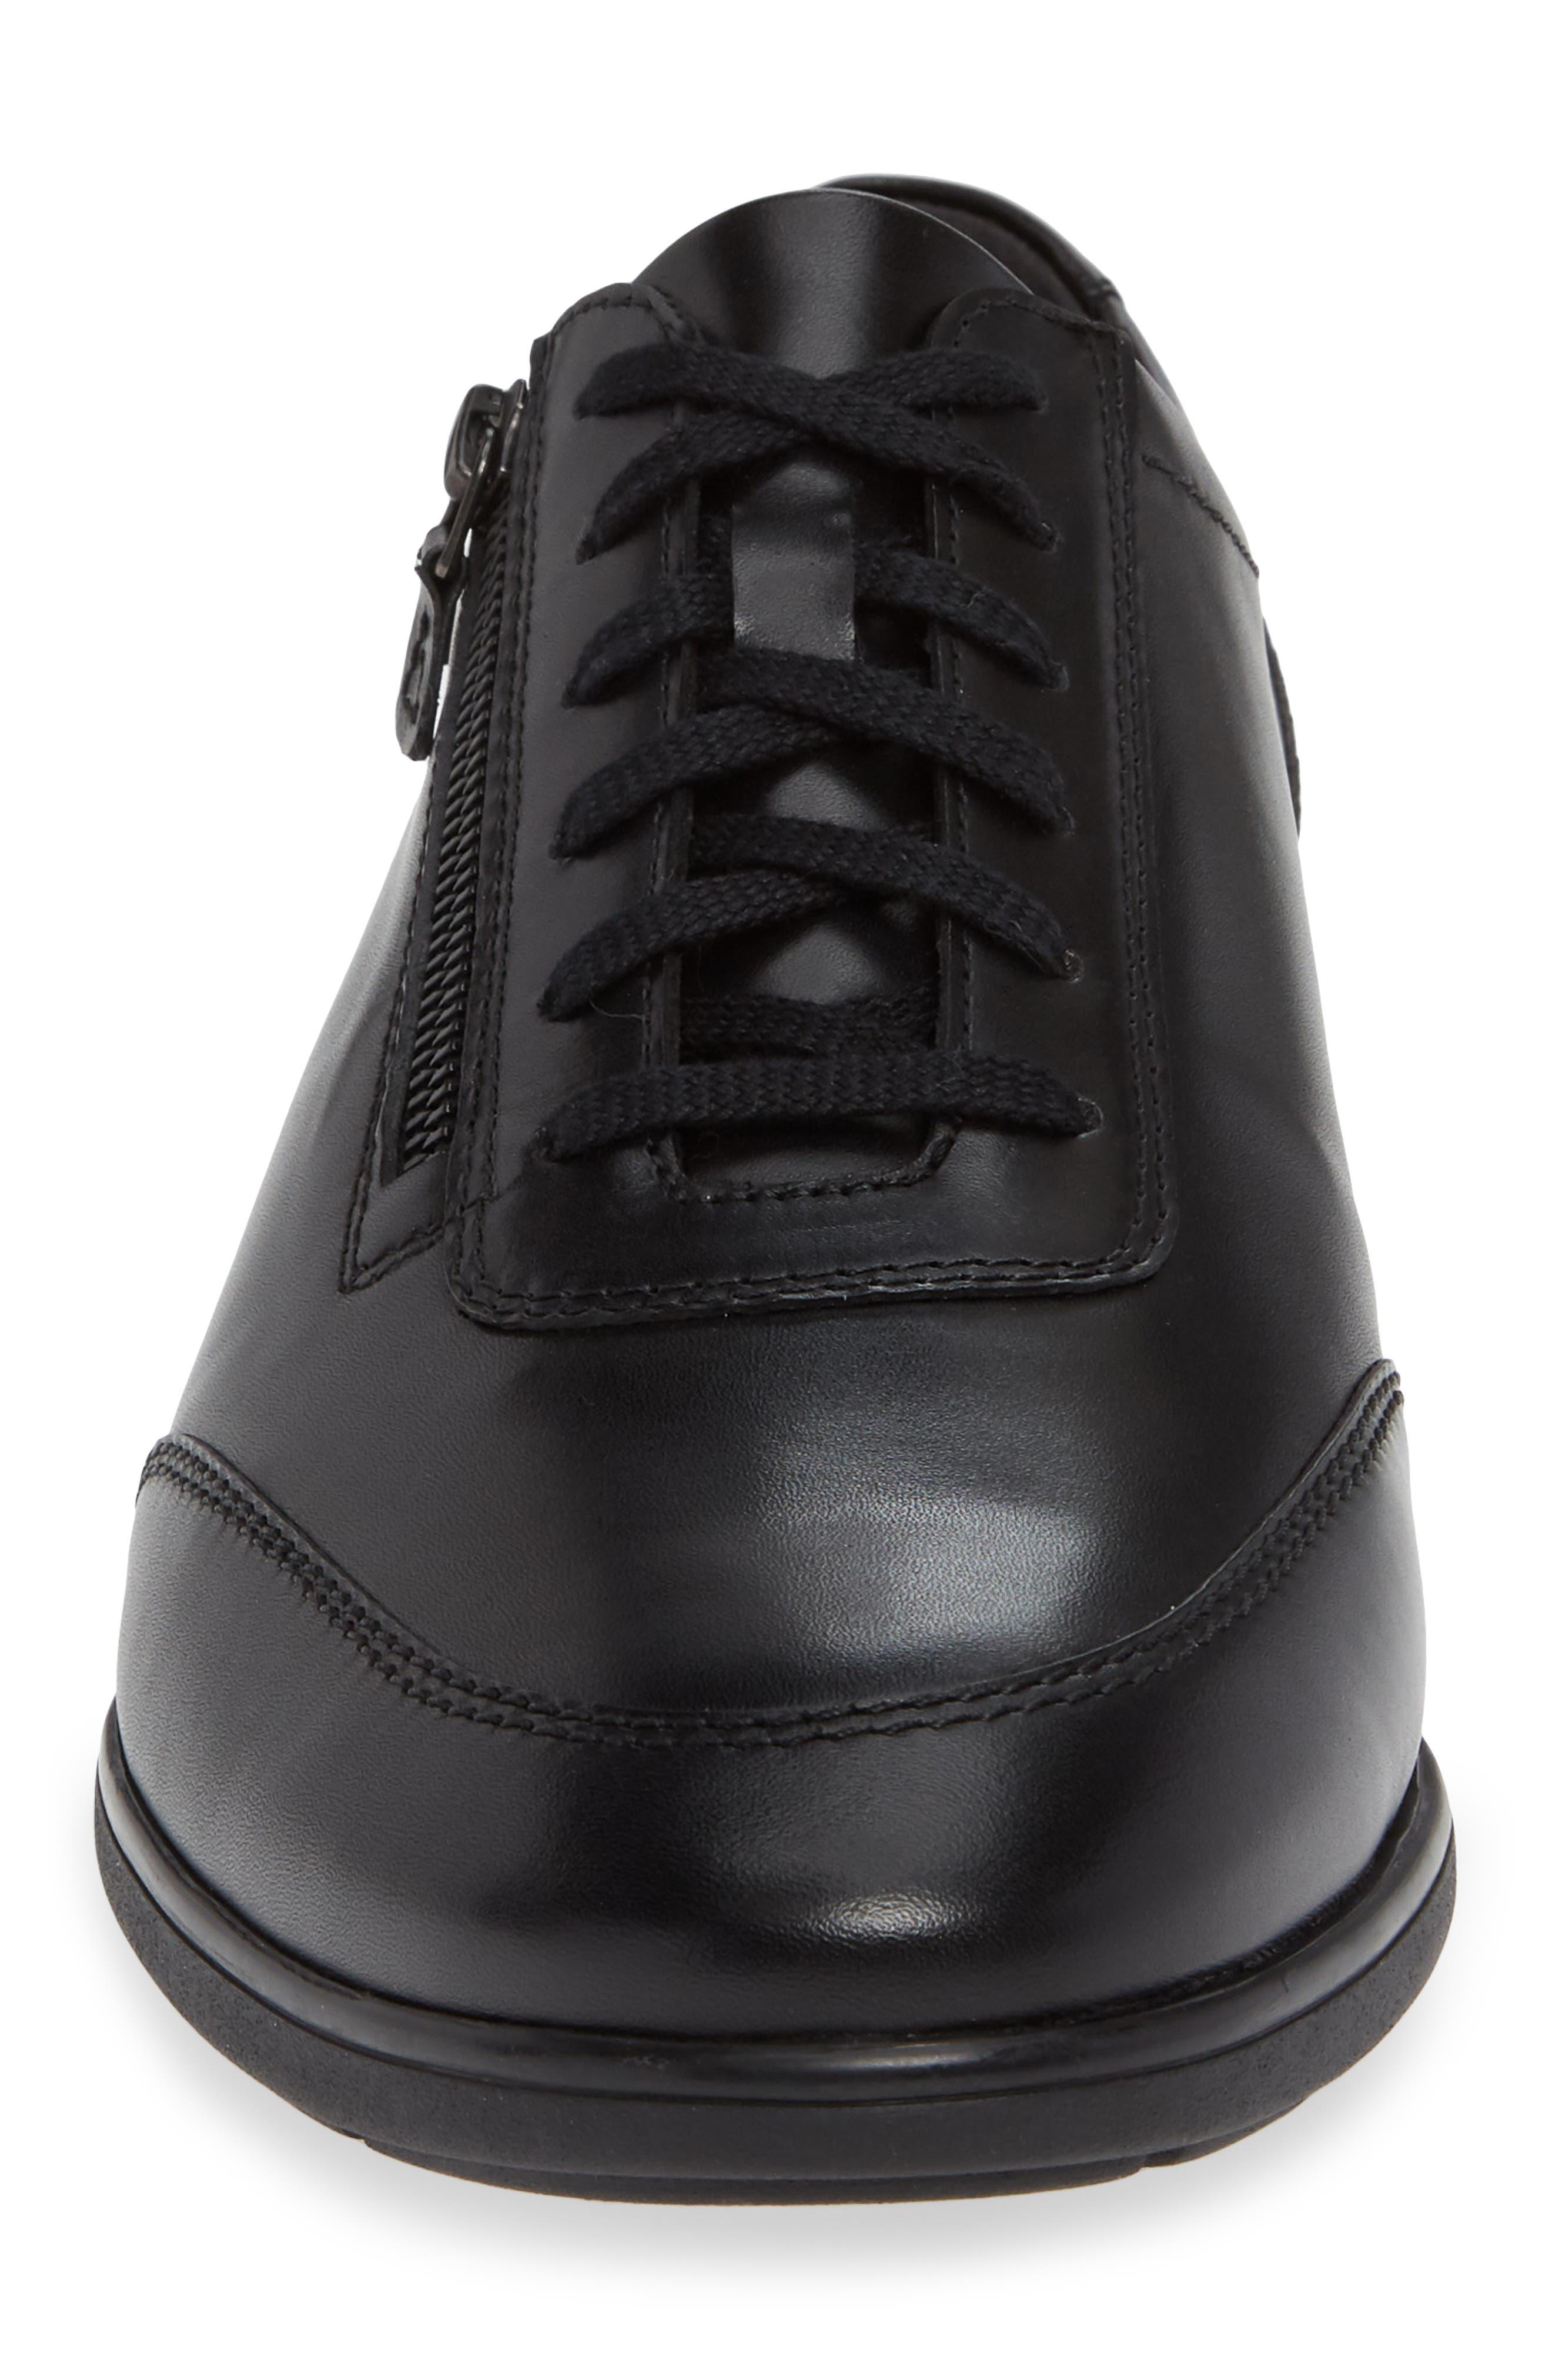 Laurent Zippered Low Top Sneaker,                             Alternate thumbnail 4, color,                             001